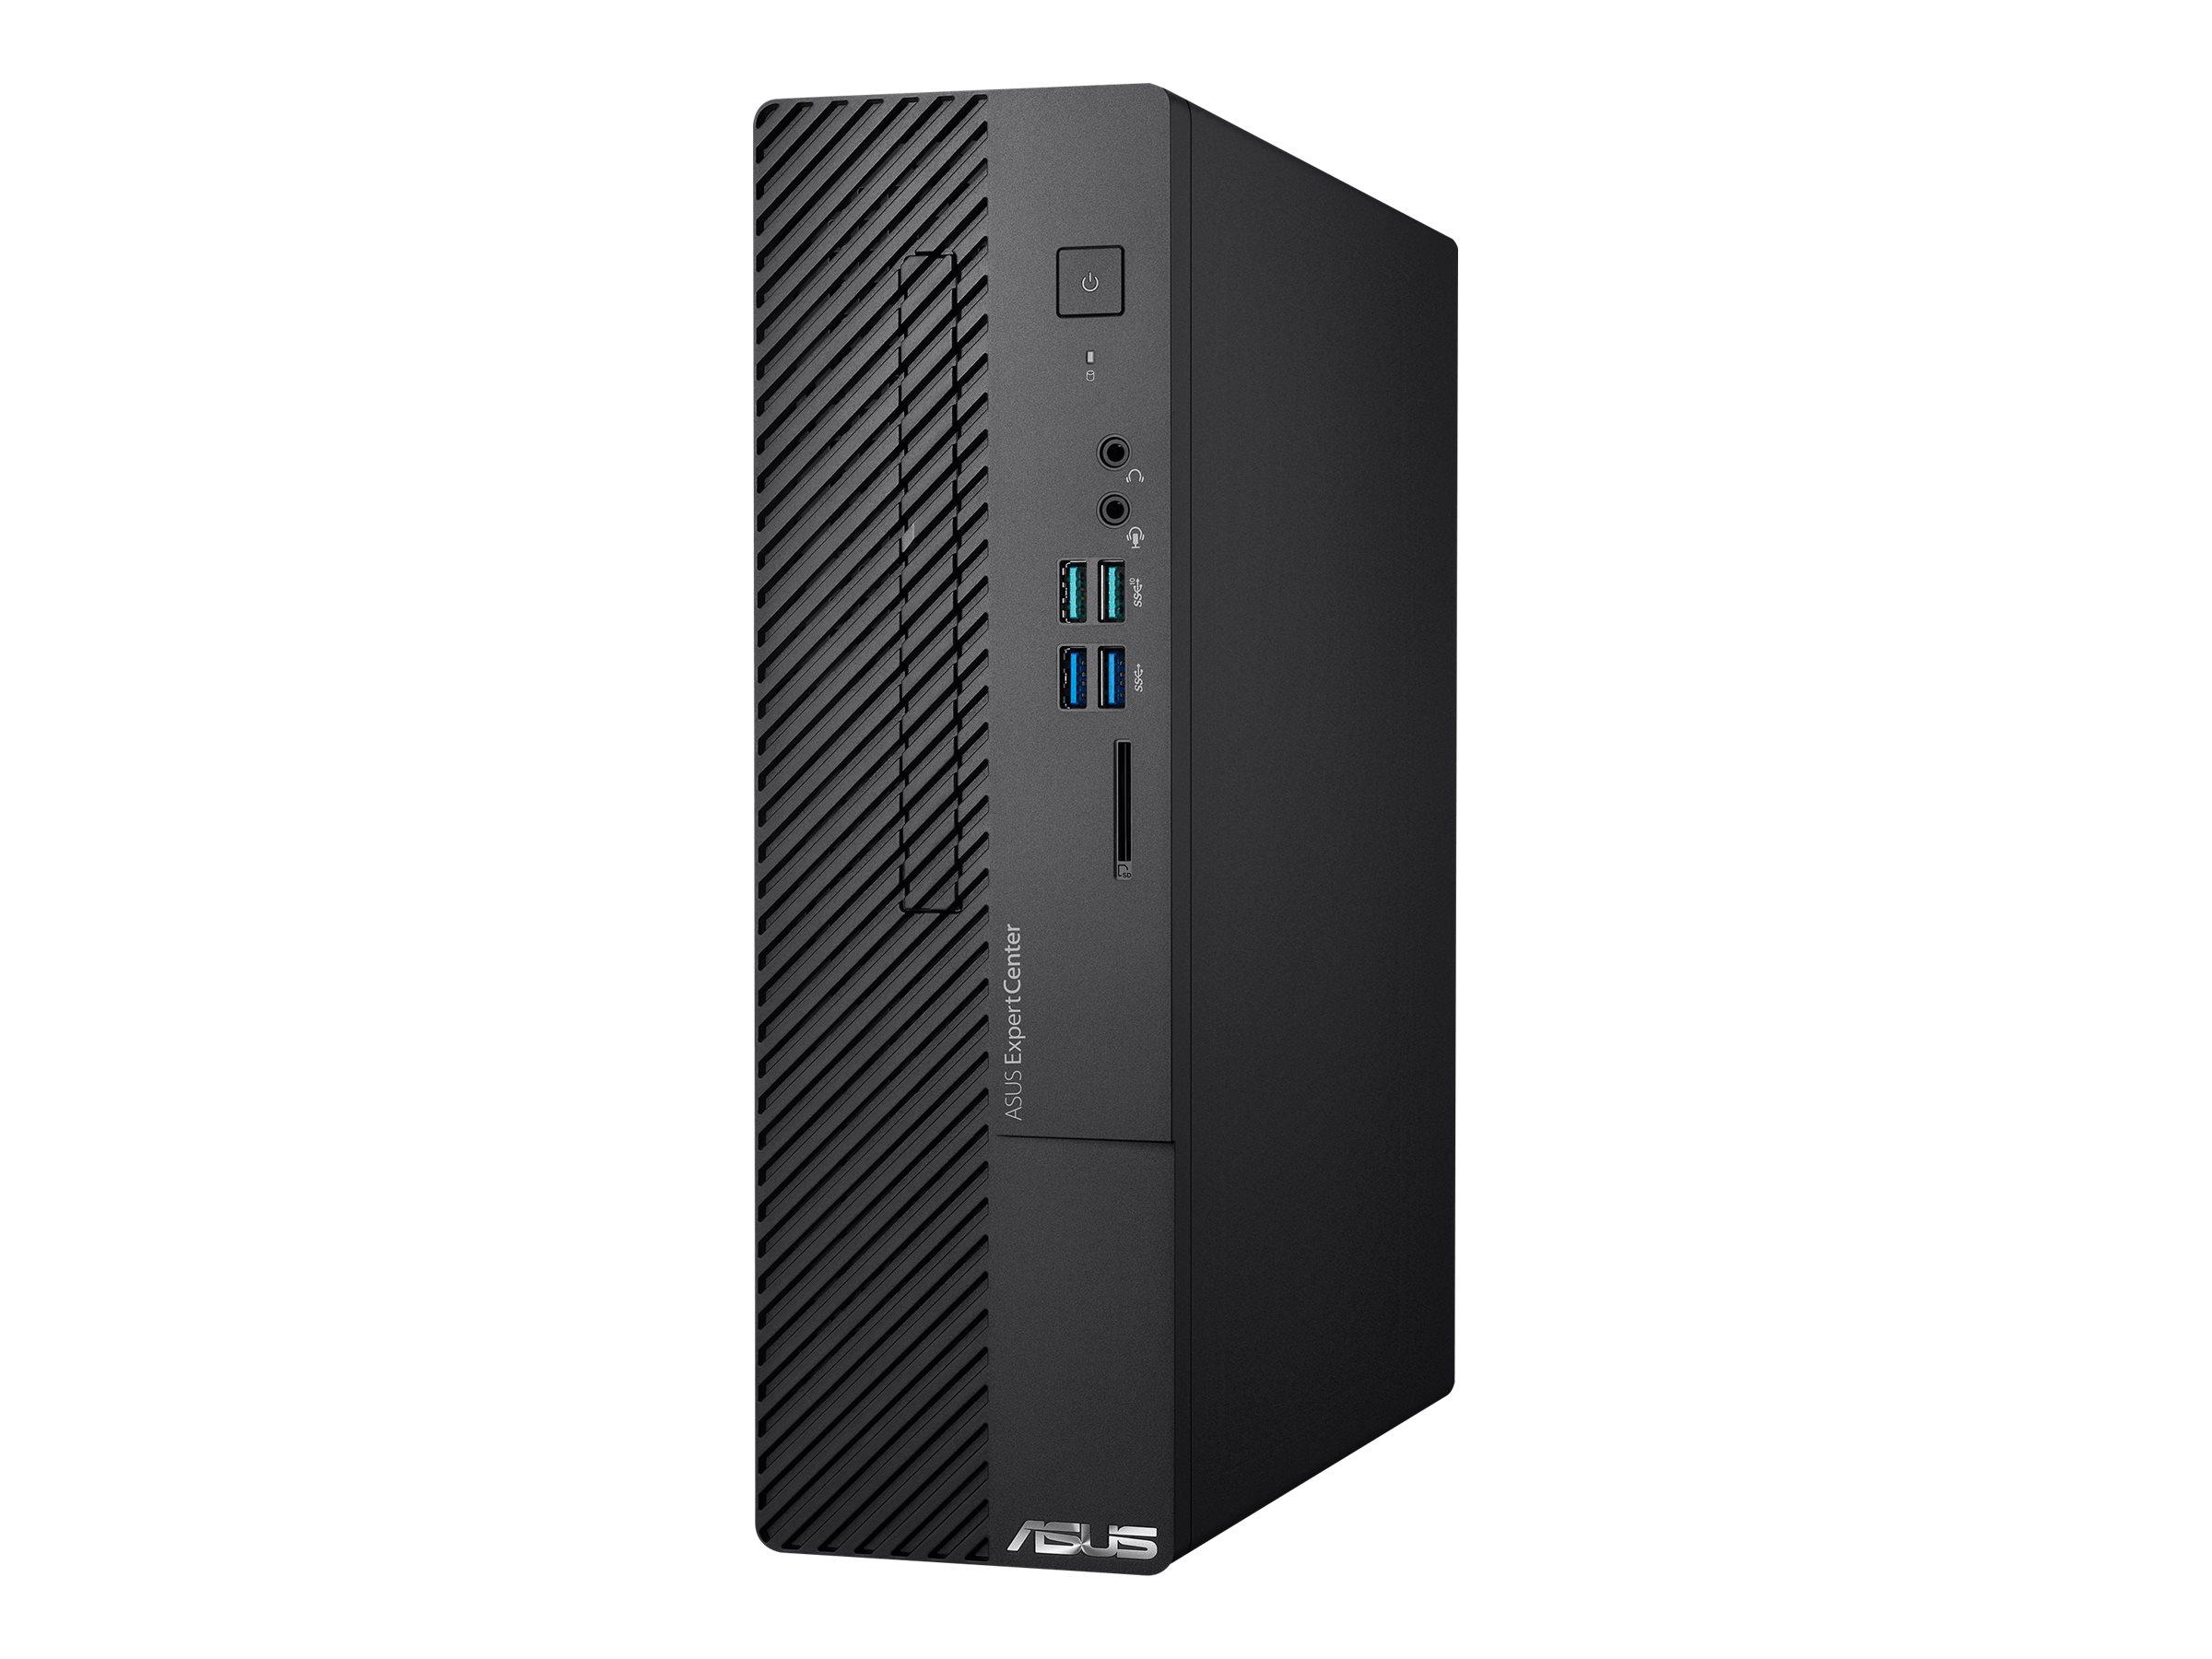 ASUS ExpertCenter D5 SFF D500SC 310105016R - SFF